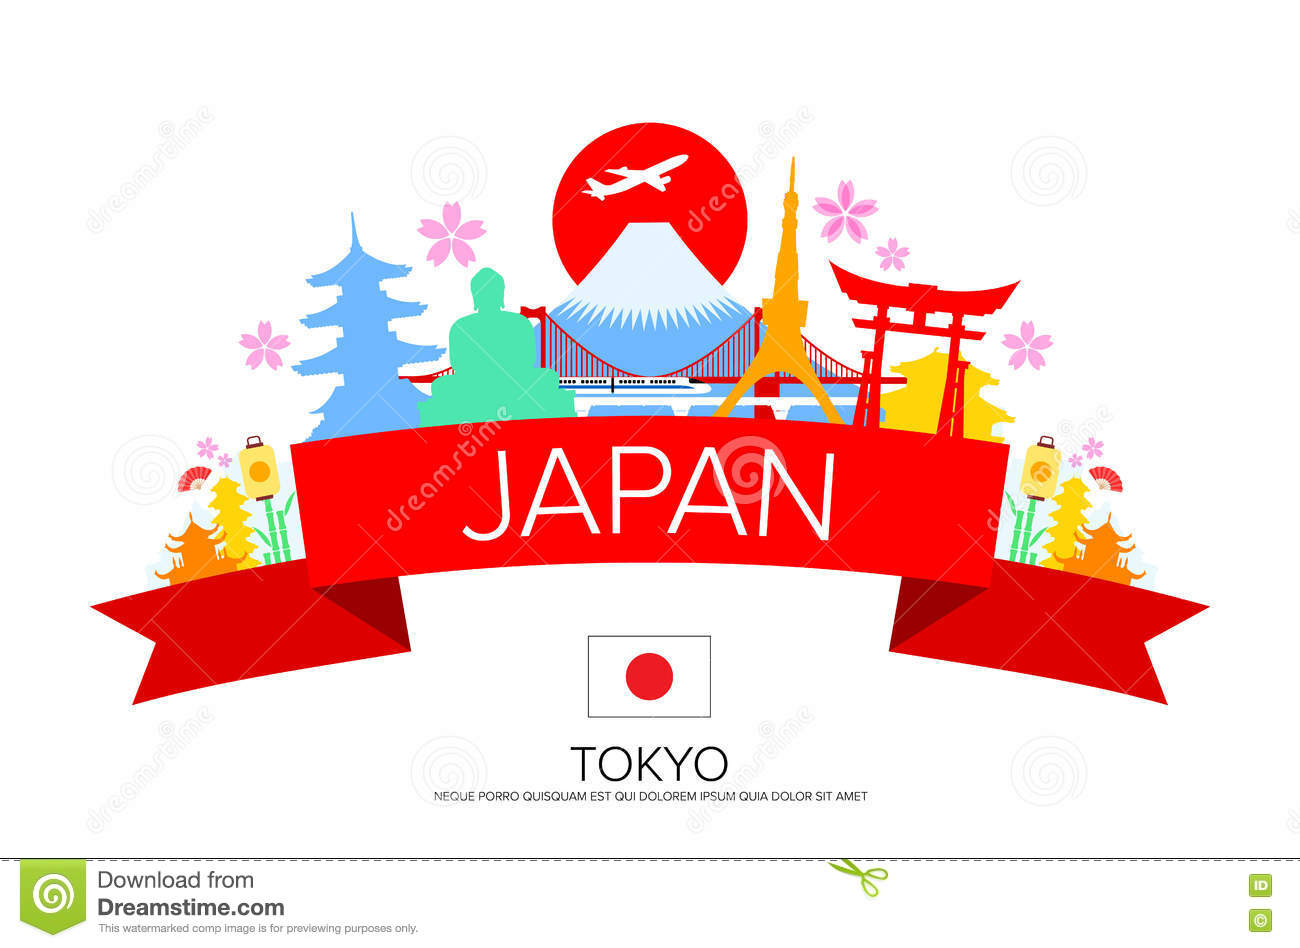 Tokyo Landmarks Stock Illustrations u201-Tokyo Landmarks Stock Illustrations u2013 255 Tokyo Landmarks Stock  Illustrations, Vectors u0026 Clipart - Dreamstime-17